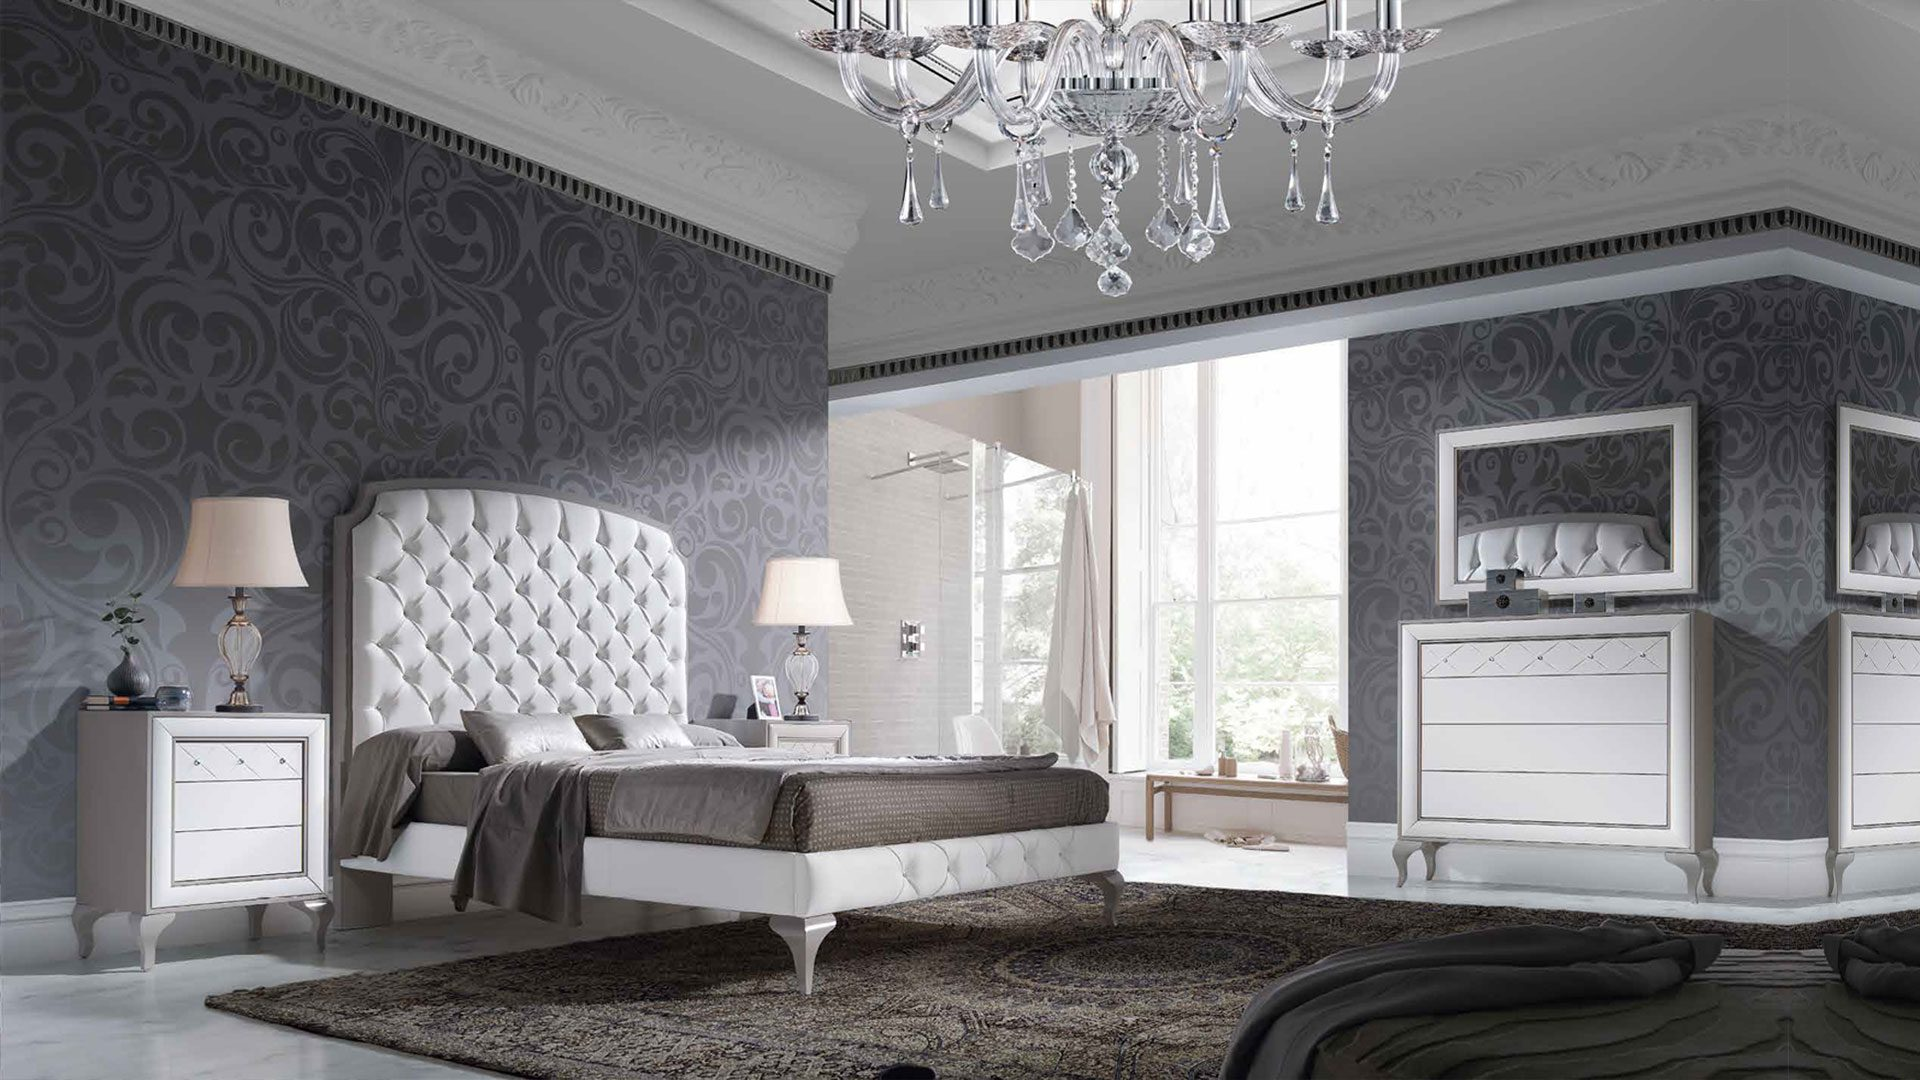 Dormitorios en Estepona, catálogo renacent